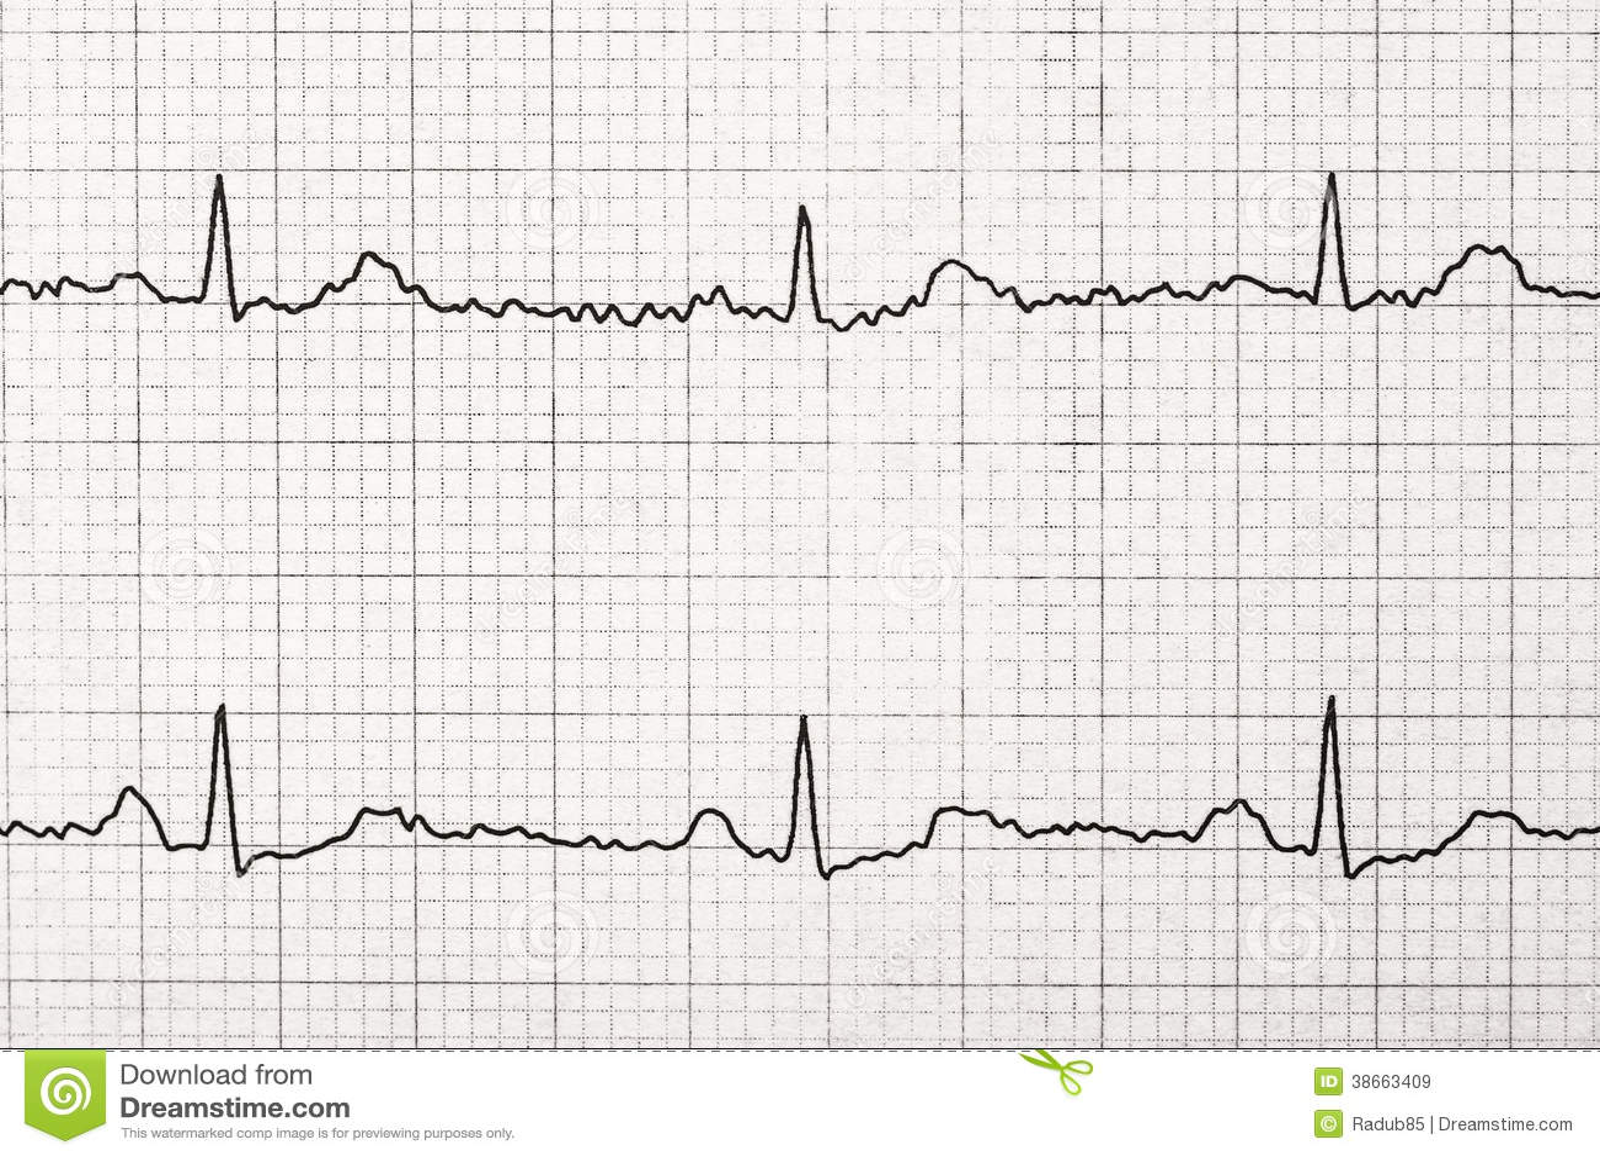 Normal Electrocardiogram Record Macro Royalty Free Stock